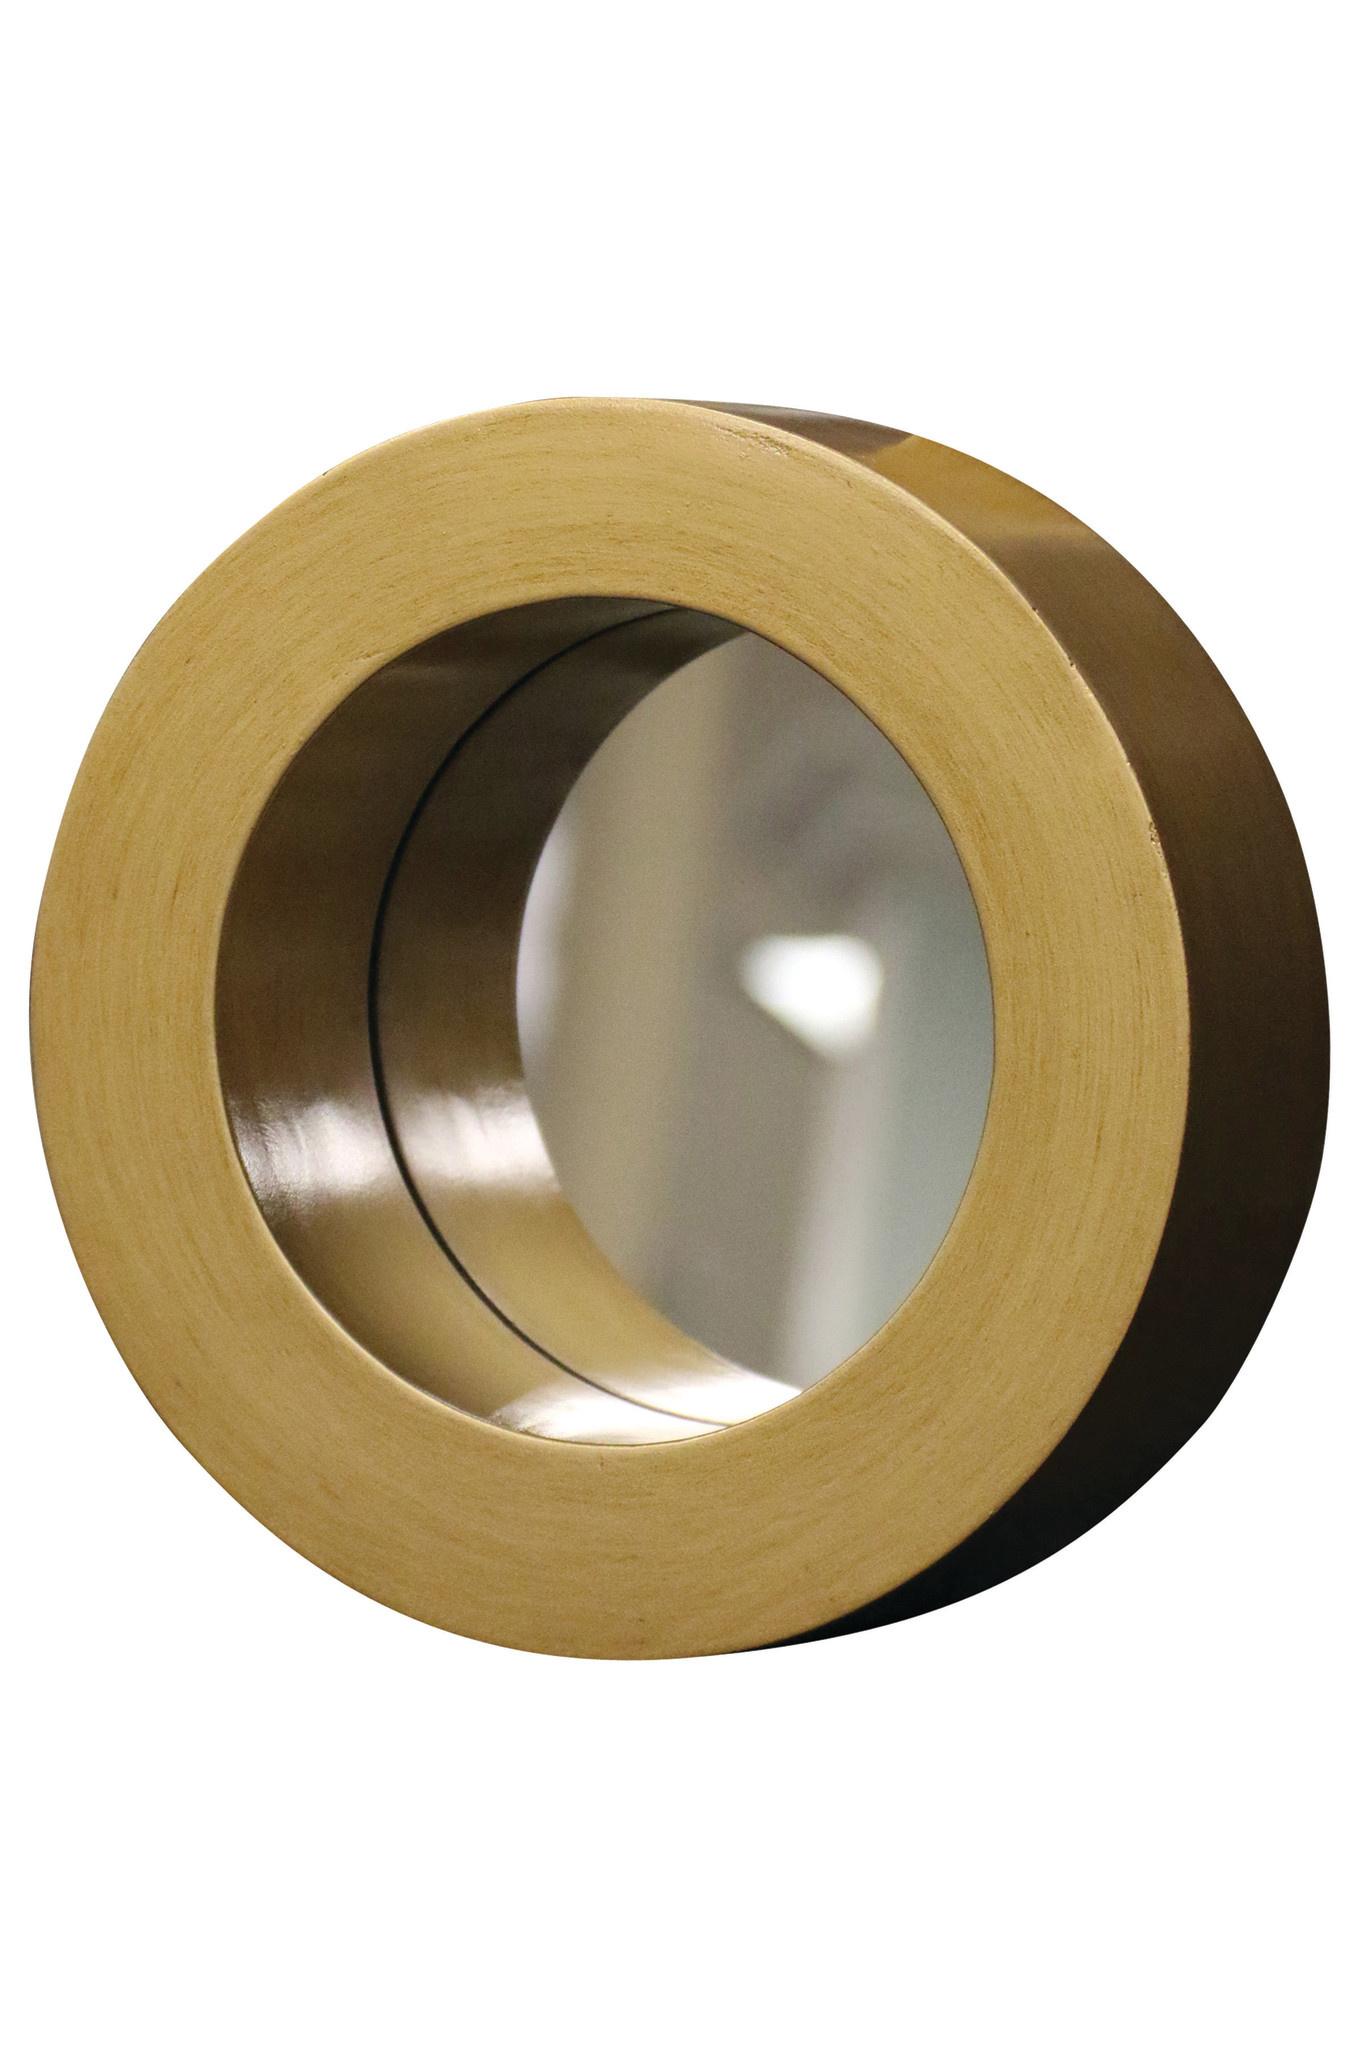 CANE MIRROR GOLD - disc